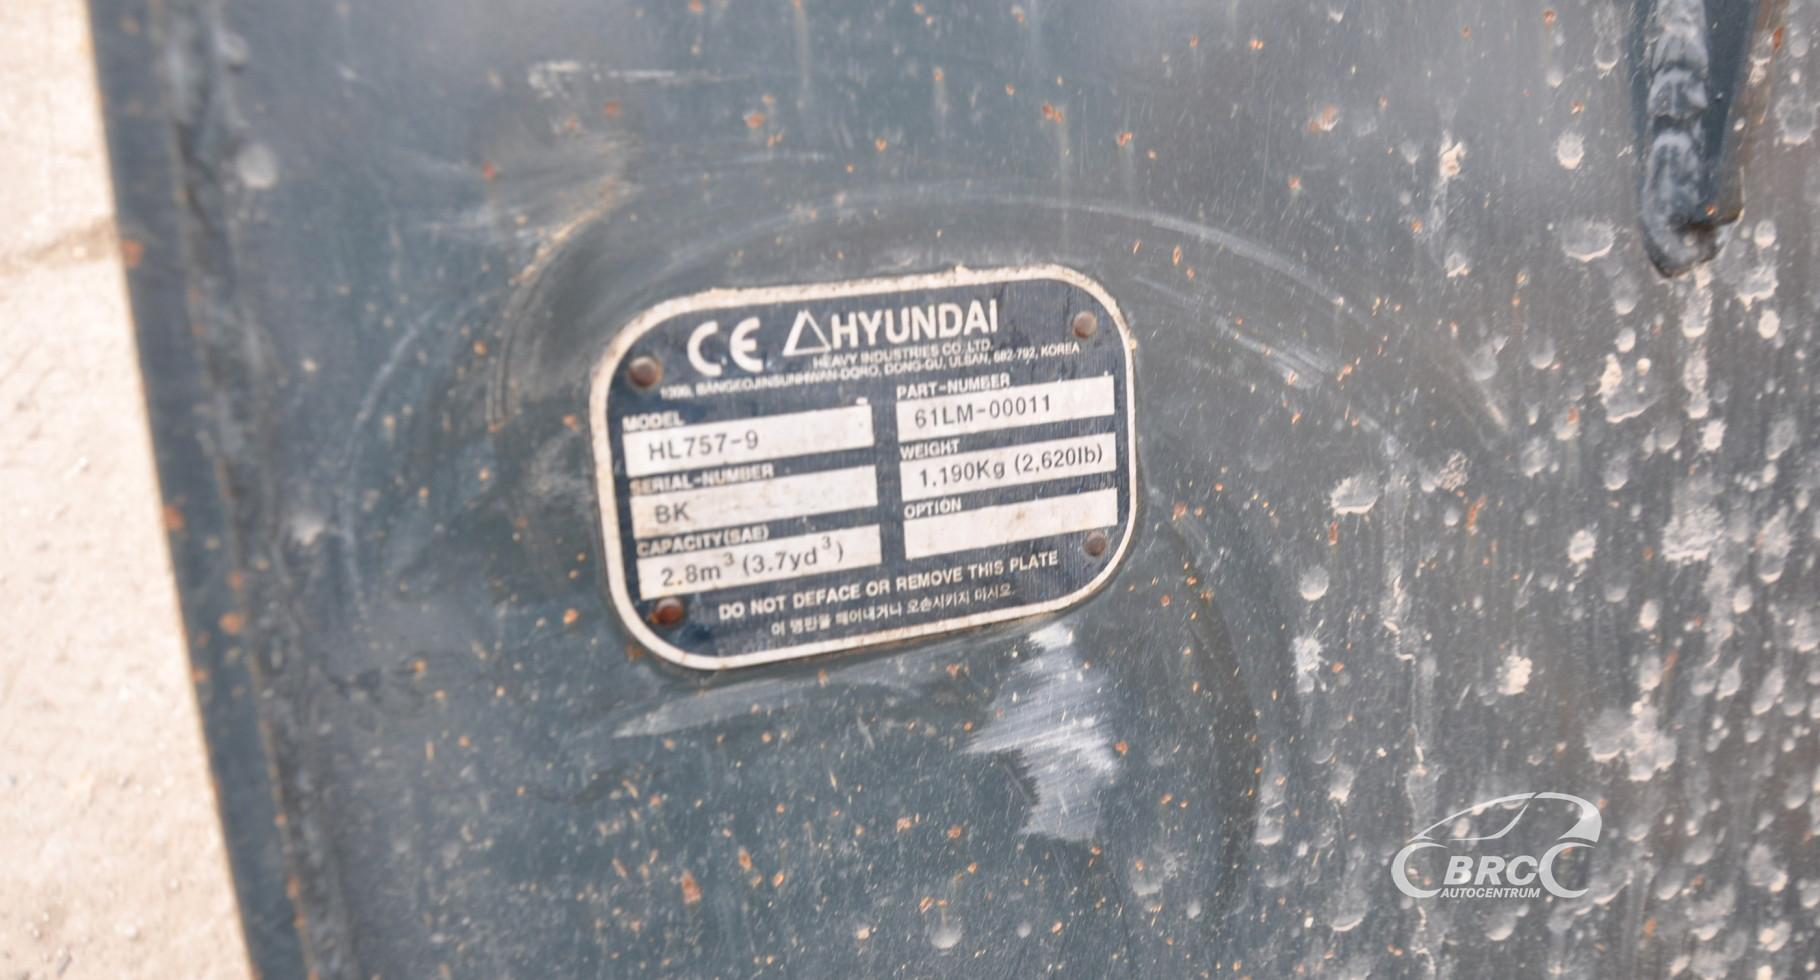 Hyundai HL757-9A